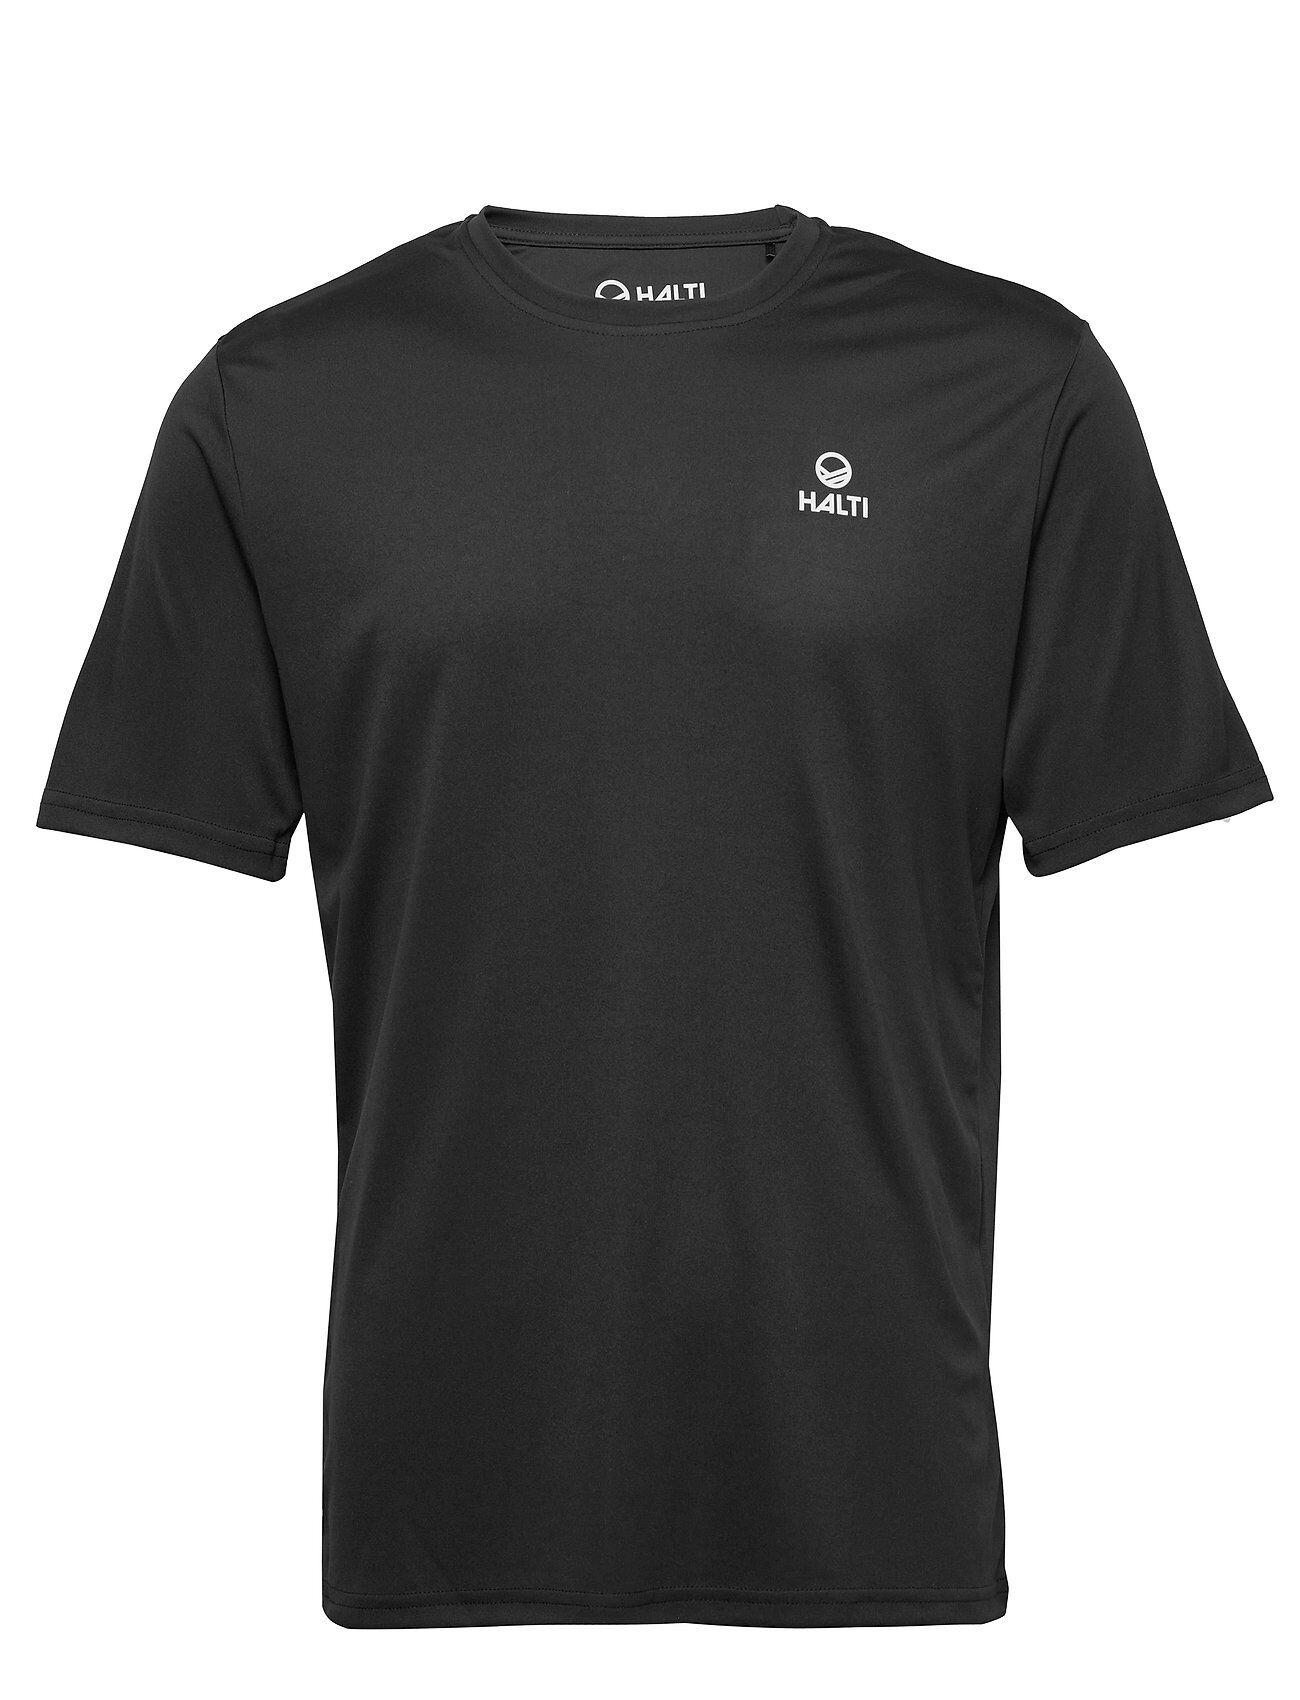 Halti Osku M T-Shirt T-shirts Short-sleeved Musta Halti